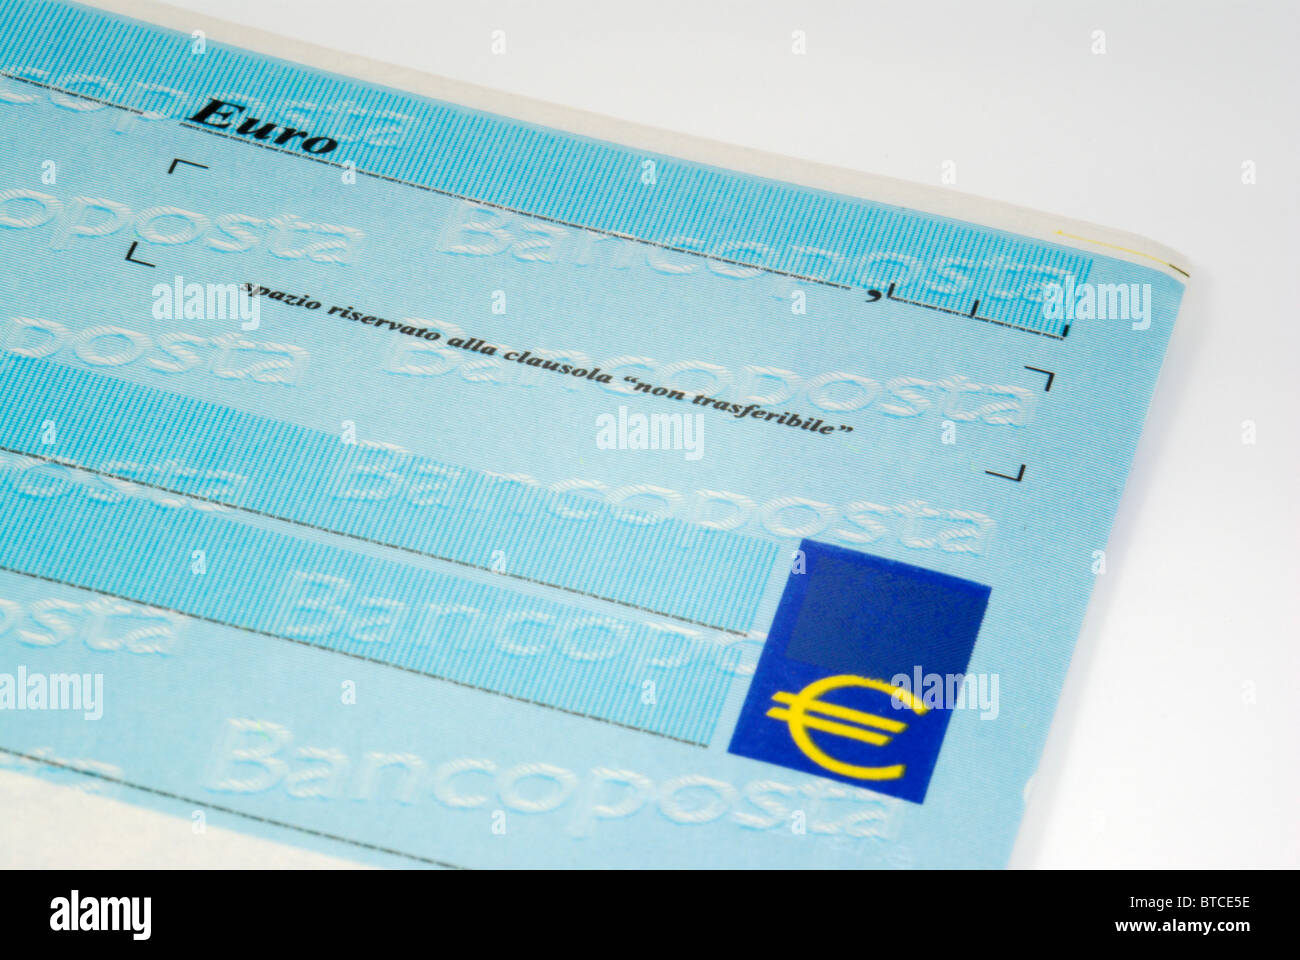 Banco Posta Italian cheque (check) close-up detail - Stock Image